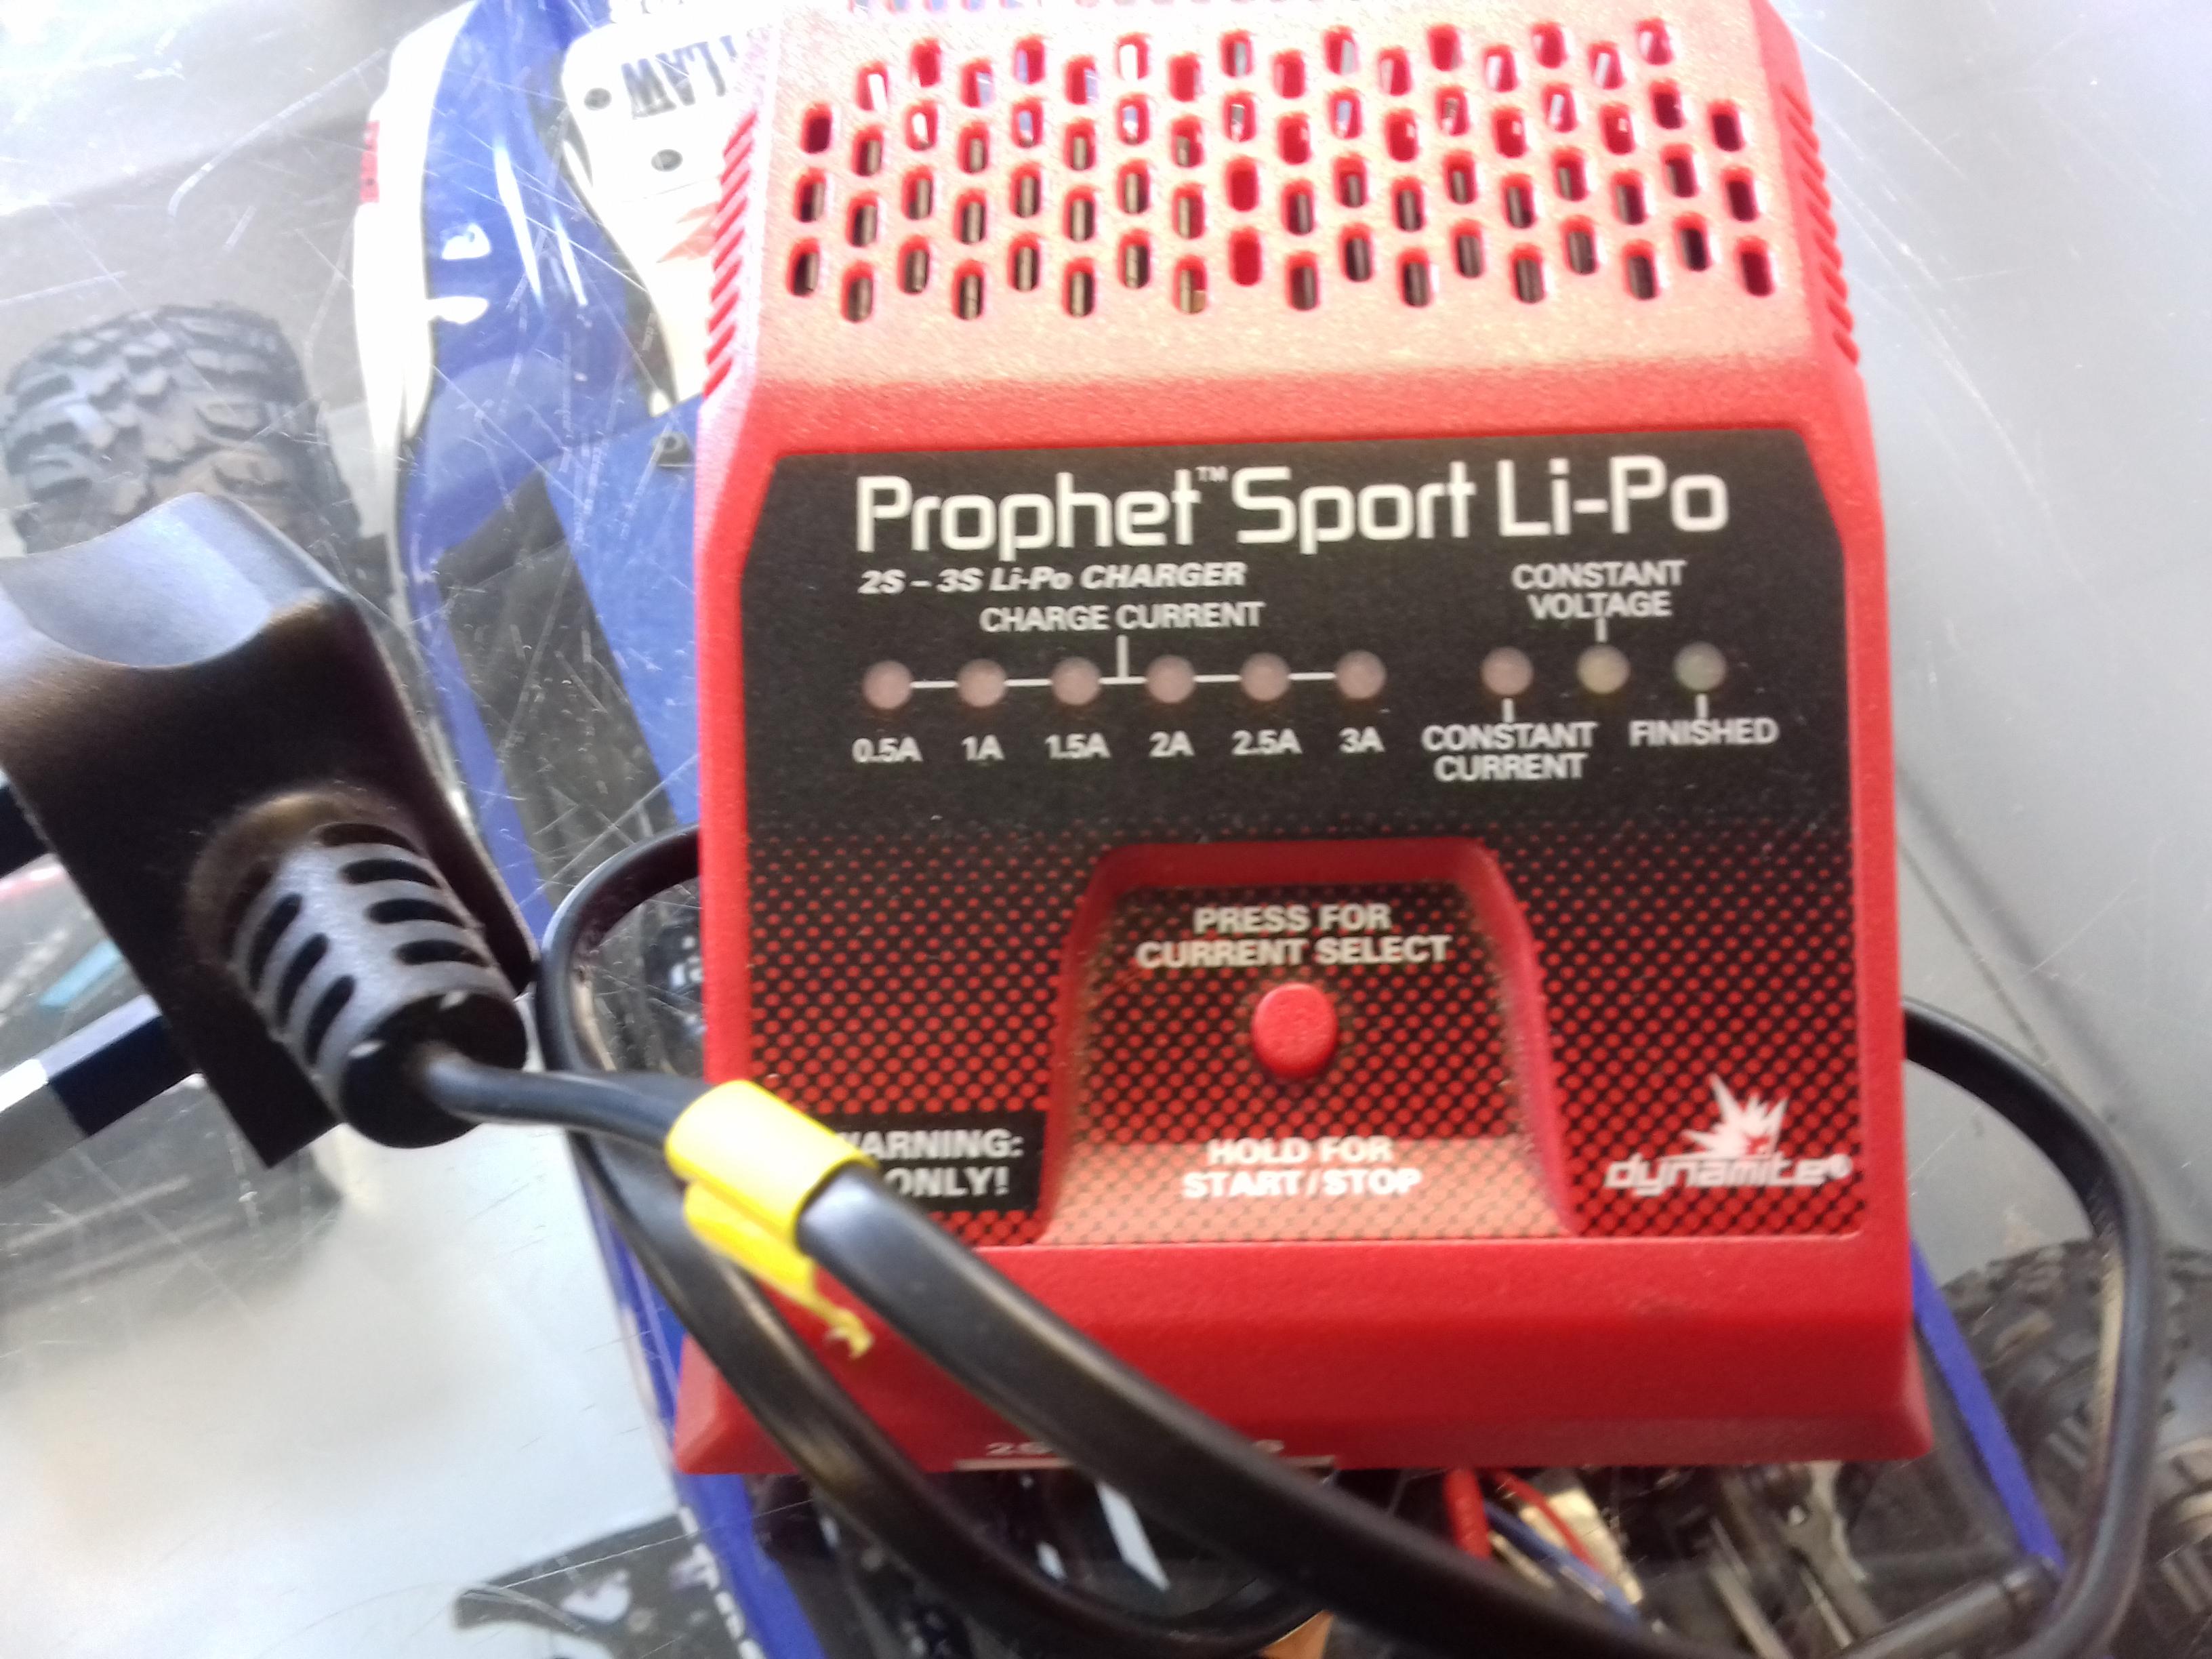 Prophet Sport Li-po 2/3s Charger